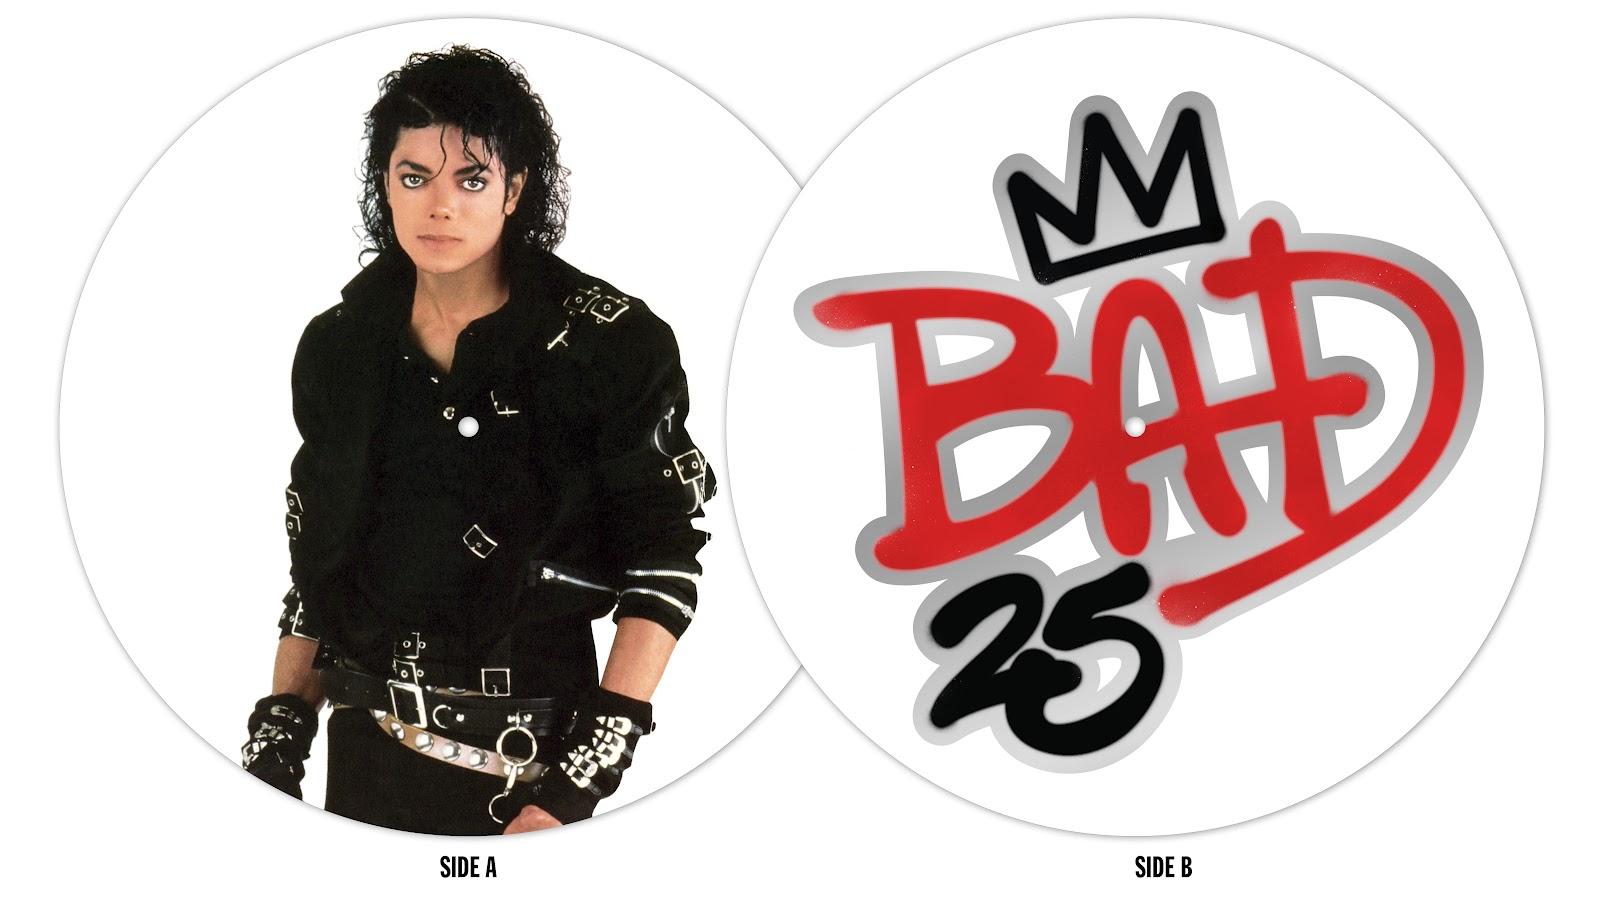 http://2.bp.blogspot.com/-NOpJem3vUWo/T_xYLpvzauI/AAAAAAAAF58/5gqFGMwu-48/s1600/MJ+Bad.jpg